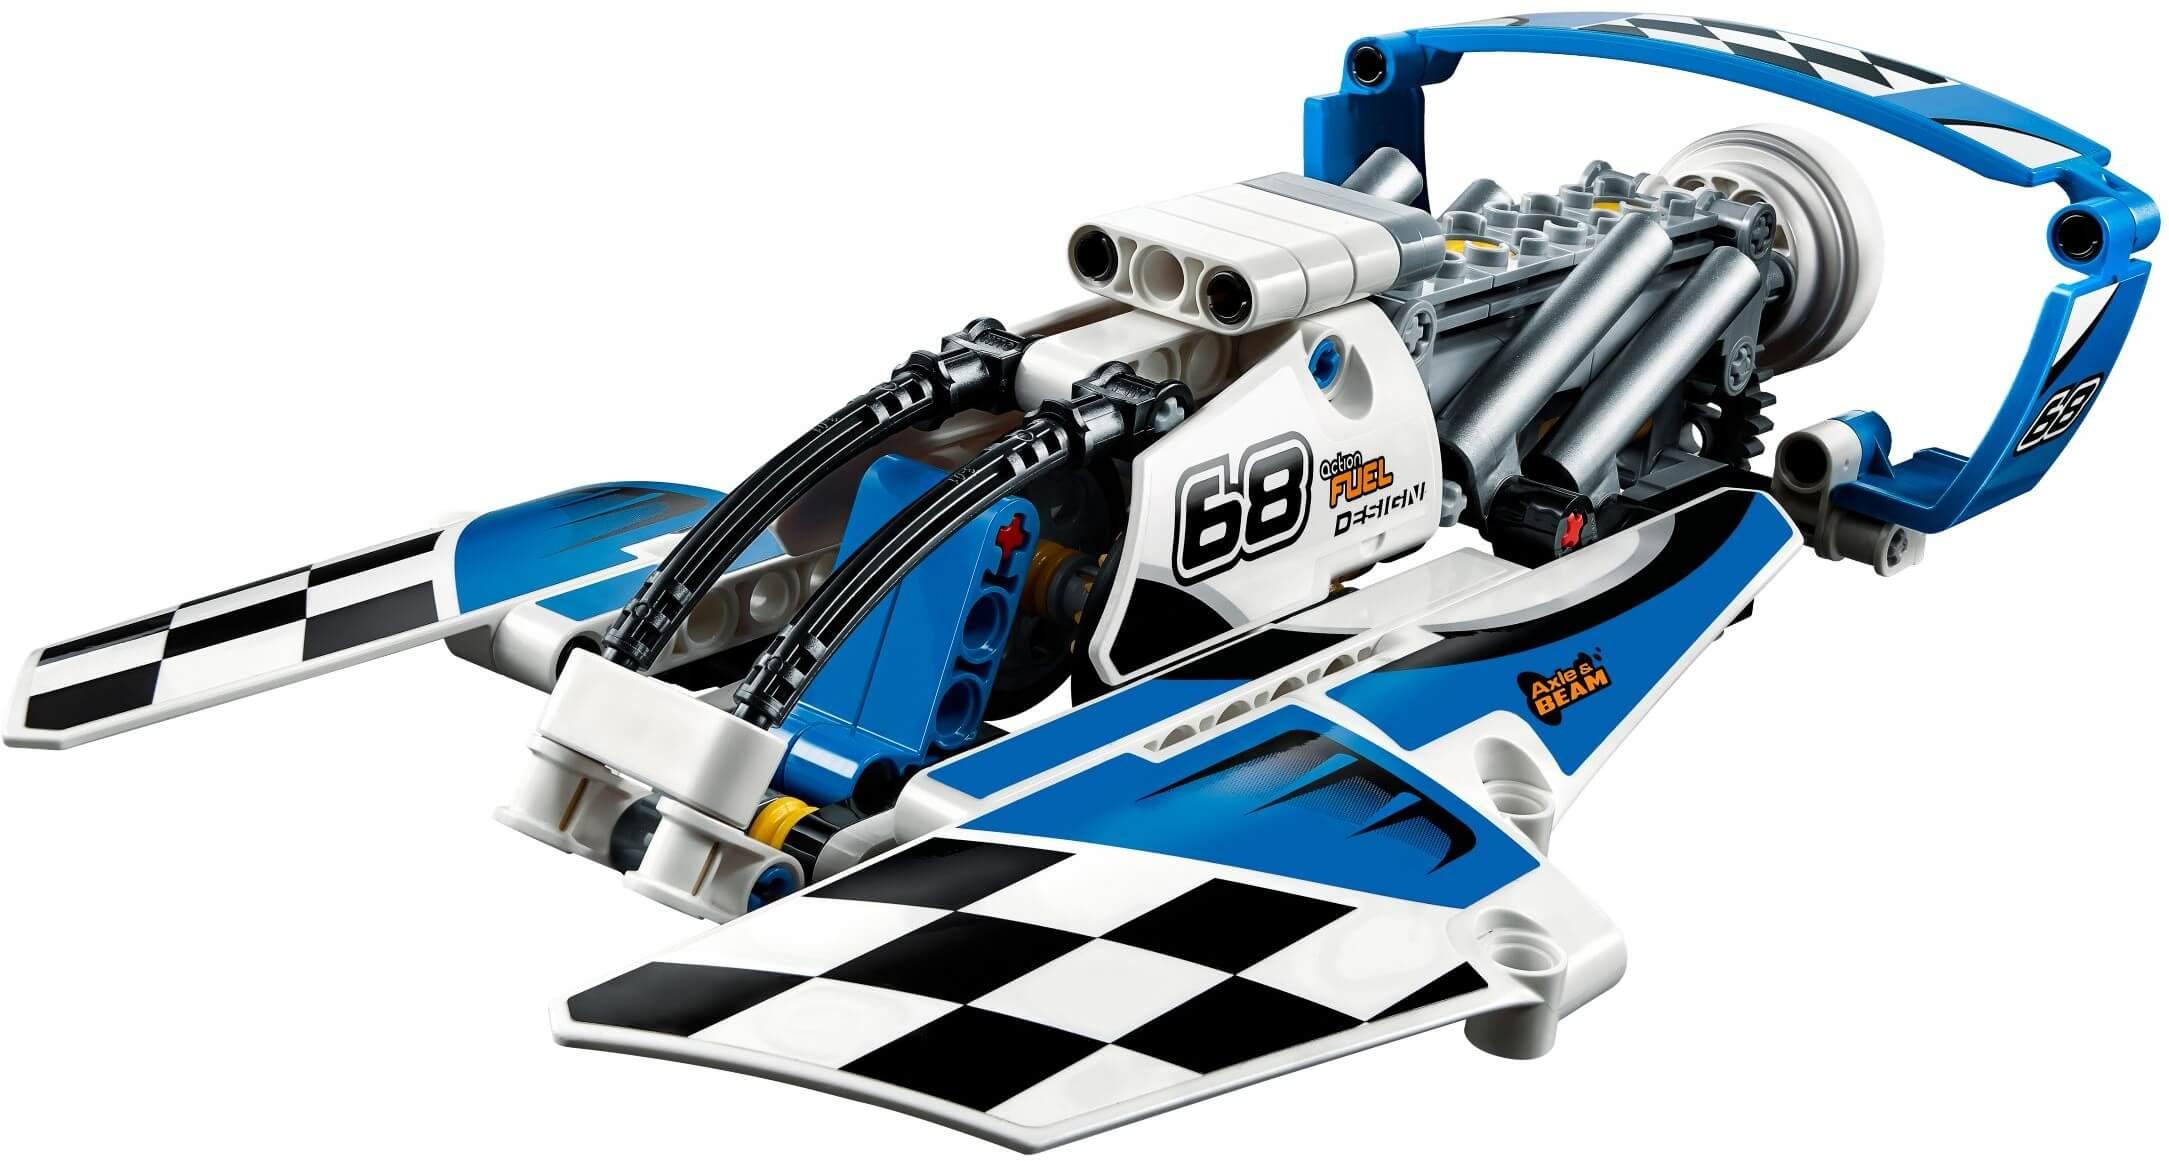 Mua đồ chơi LEGO 42045 - LEGO Technic 42045 - Thuyền đua siêu tốc (LEGO Technic Hydroplane Racer 42045)